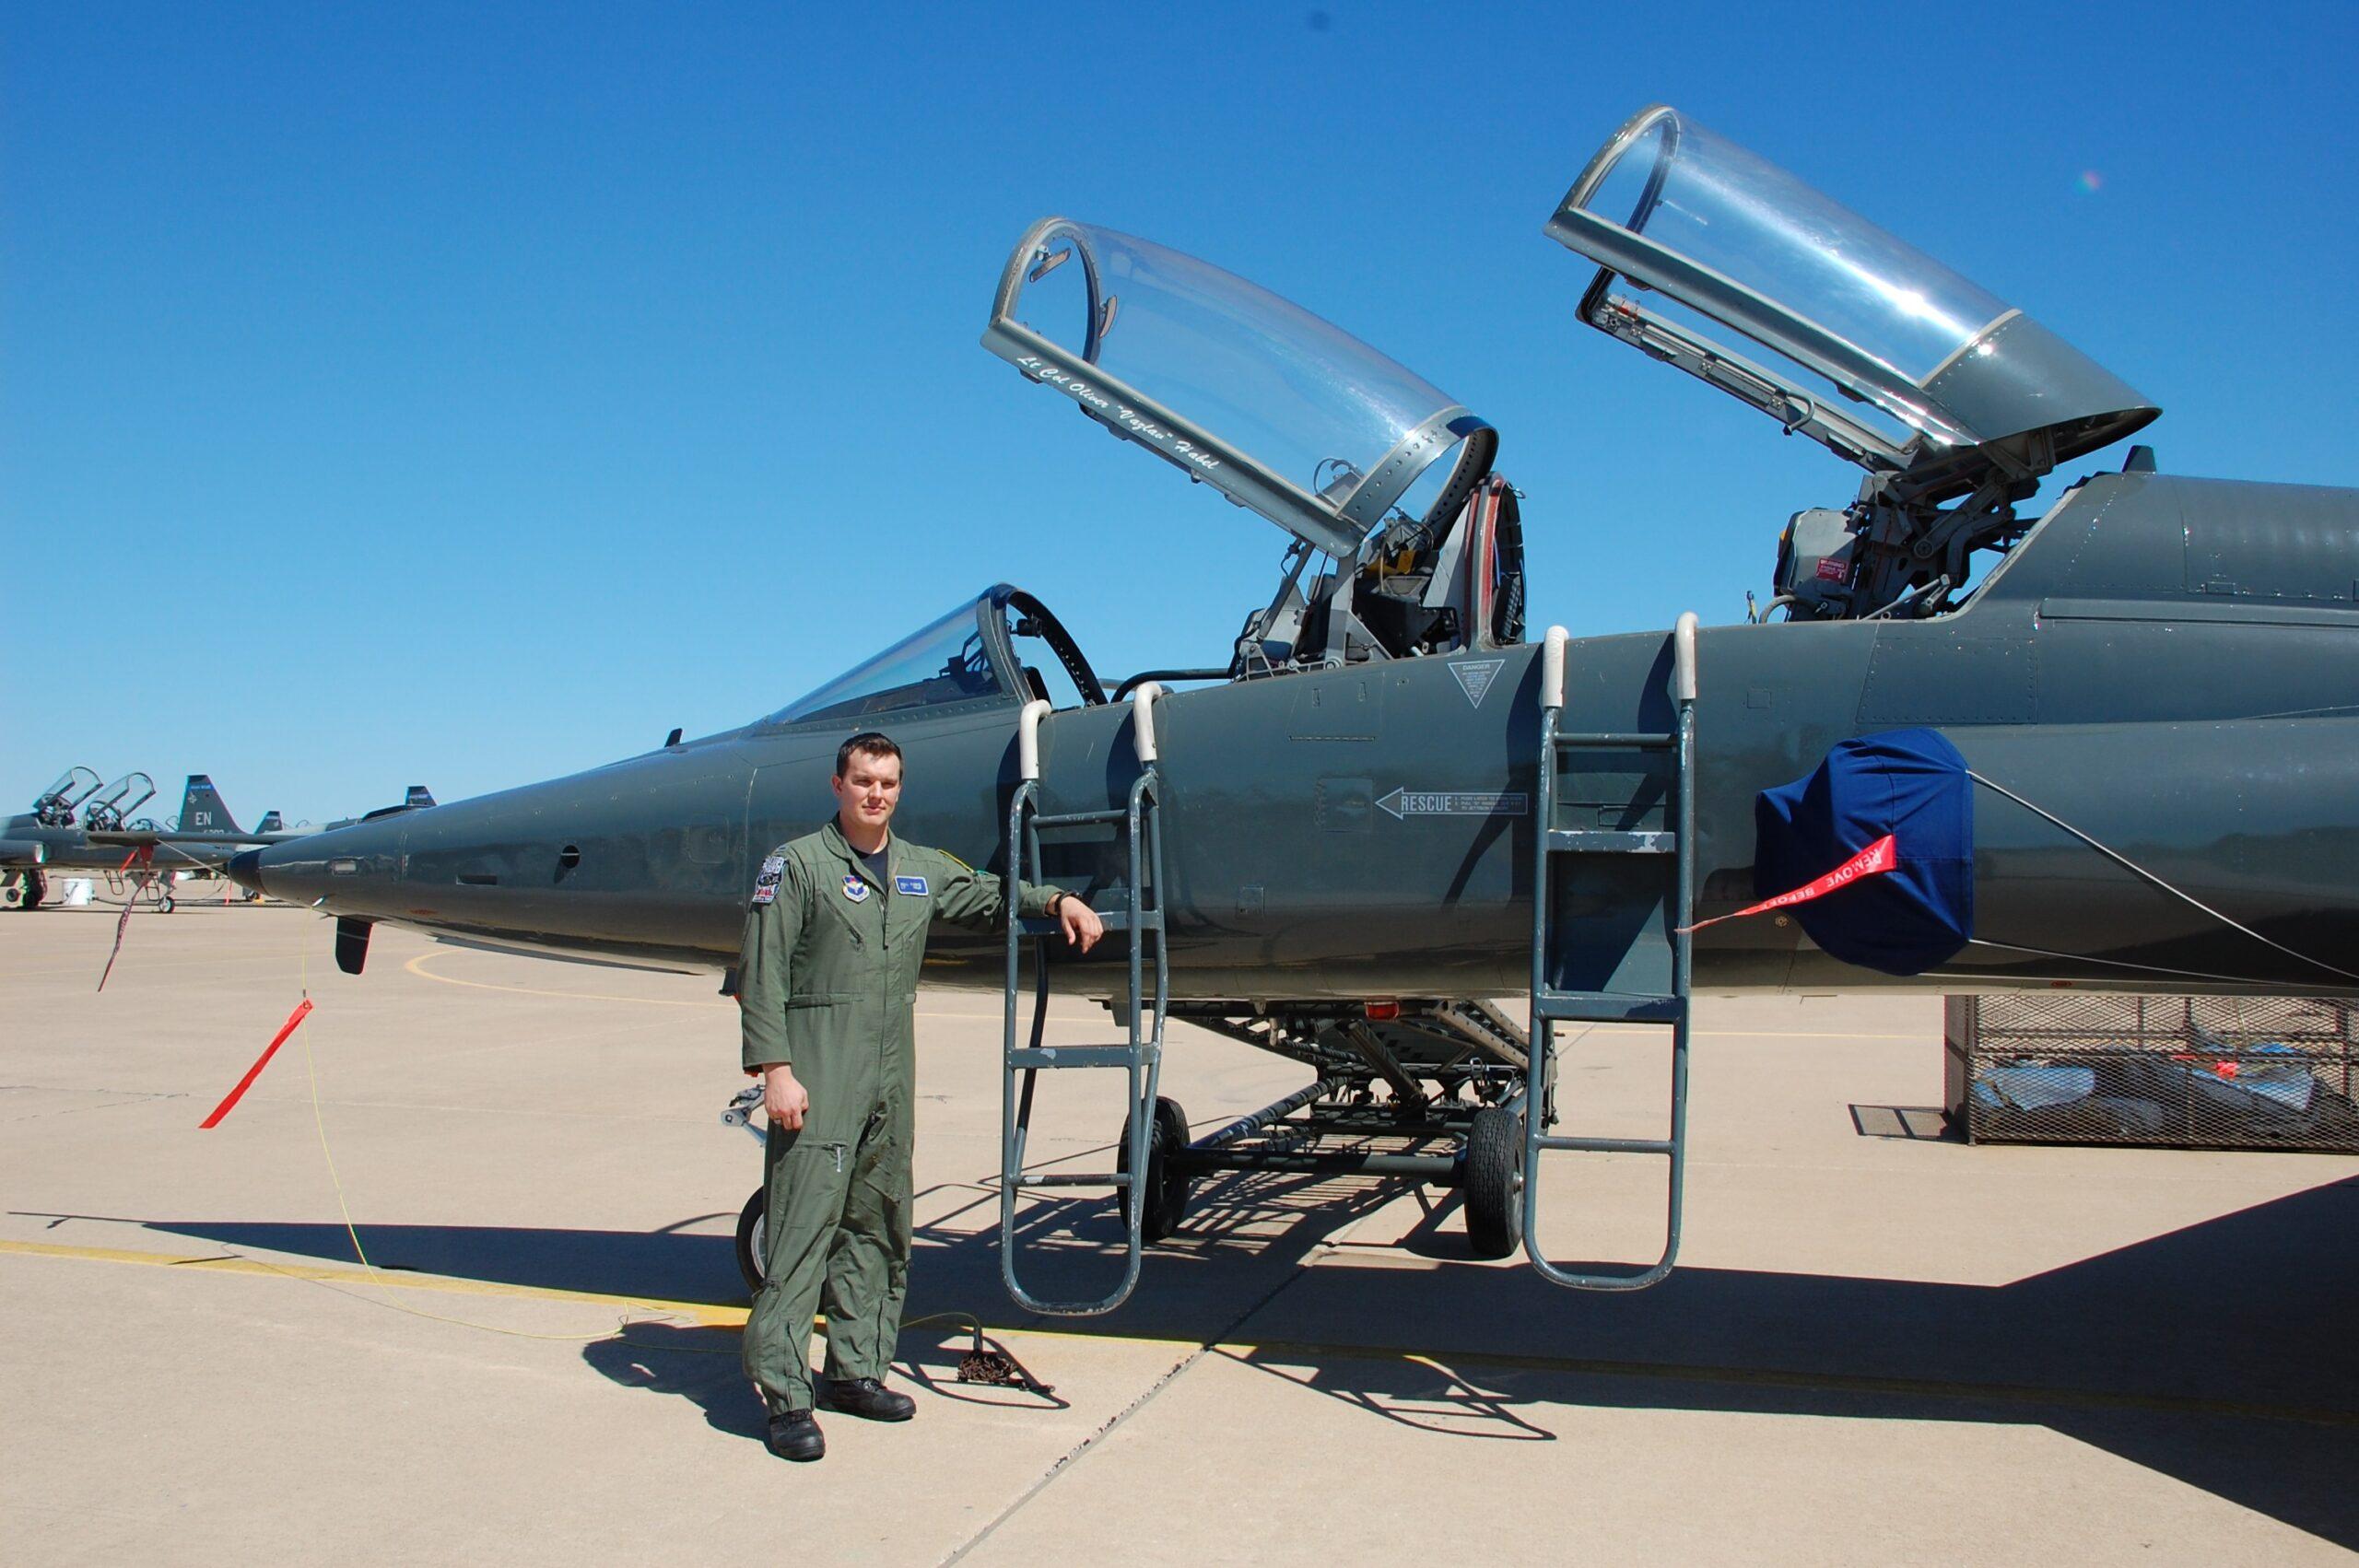 Son posing by plane